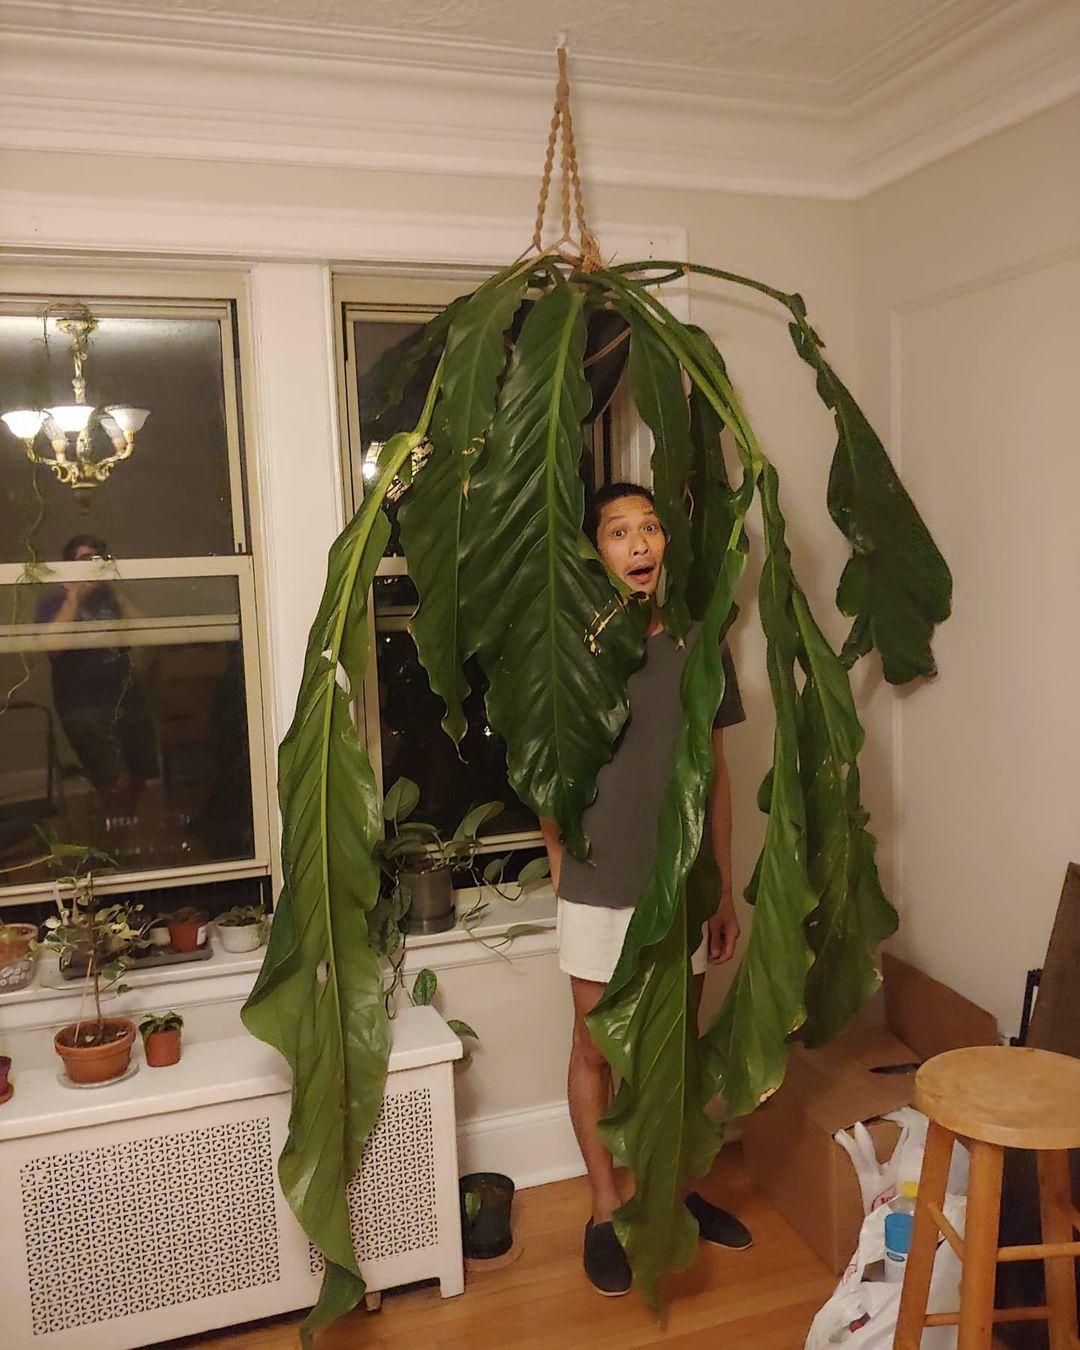 planta gigante